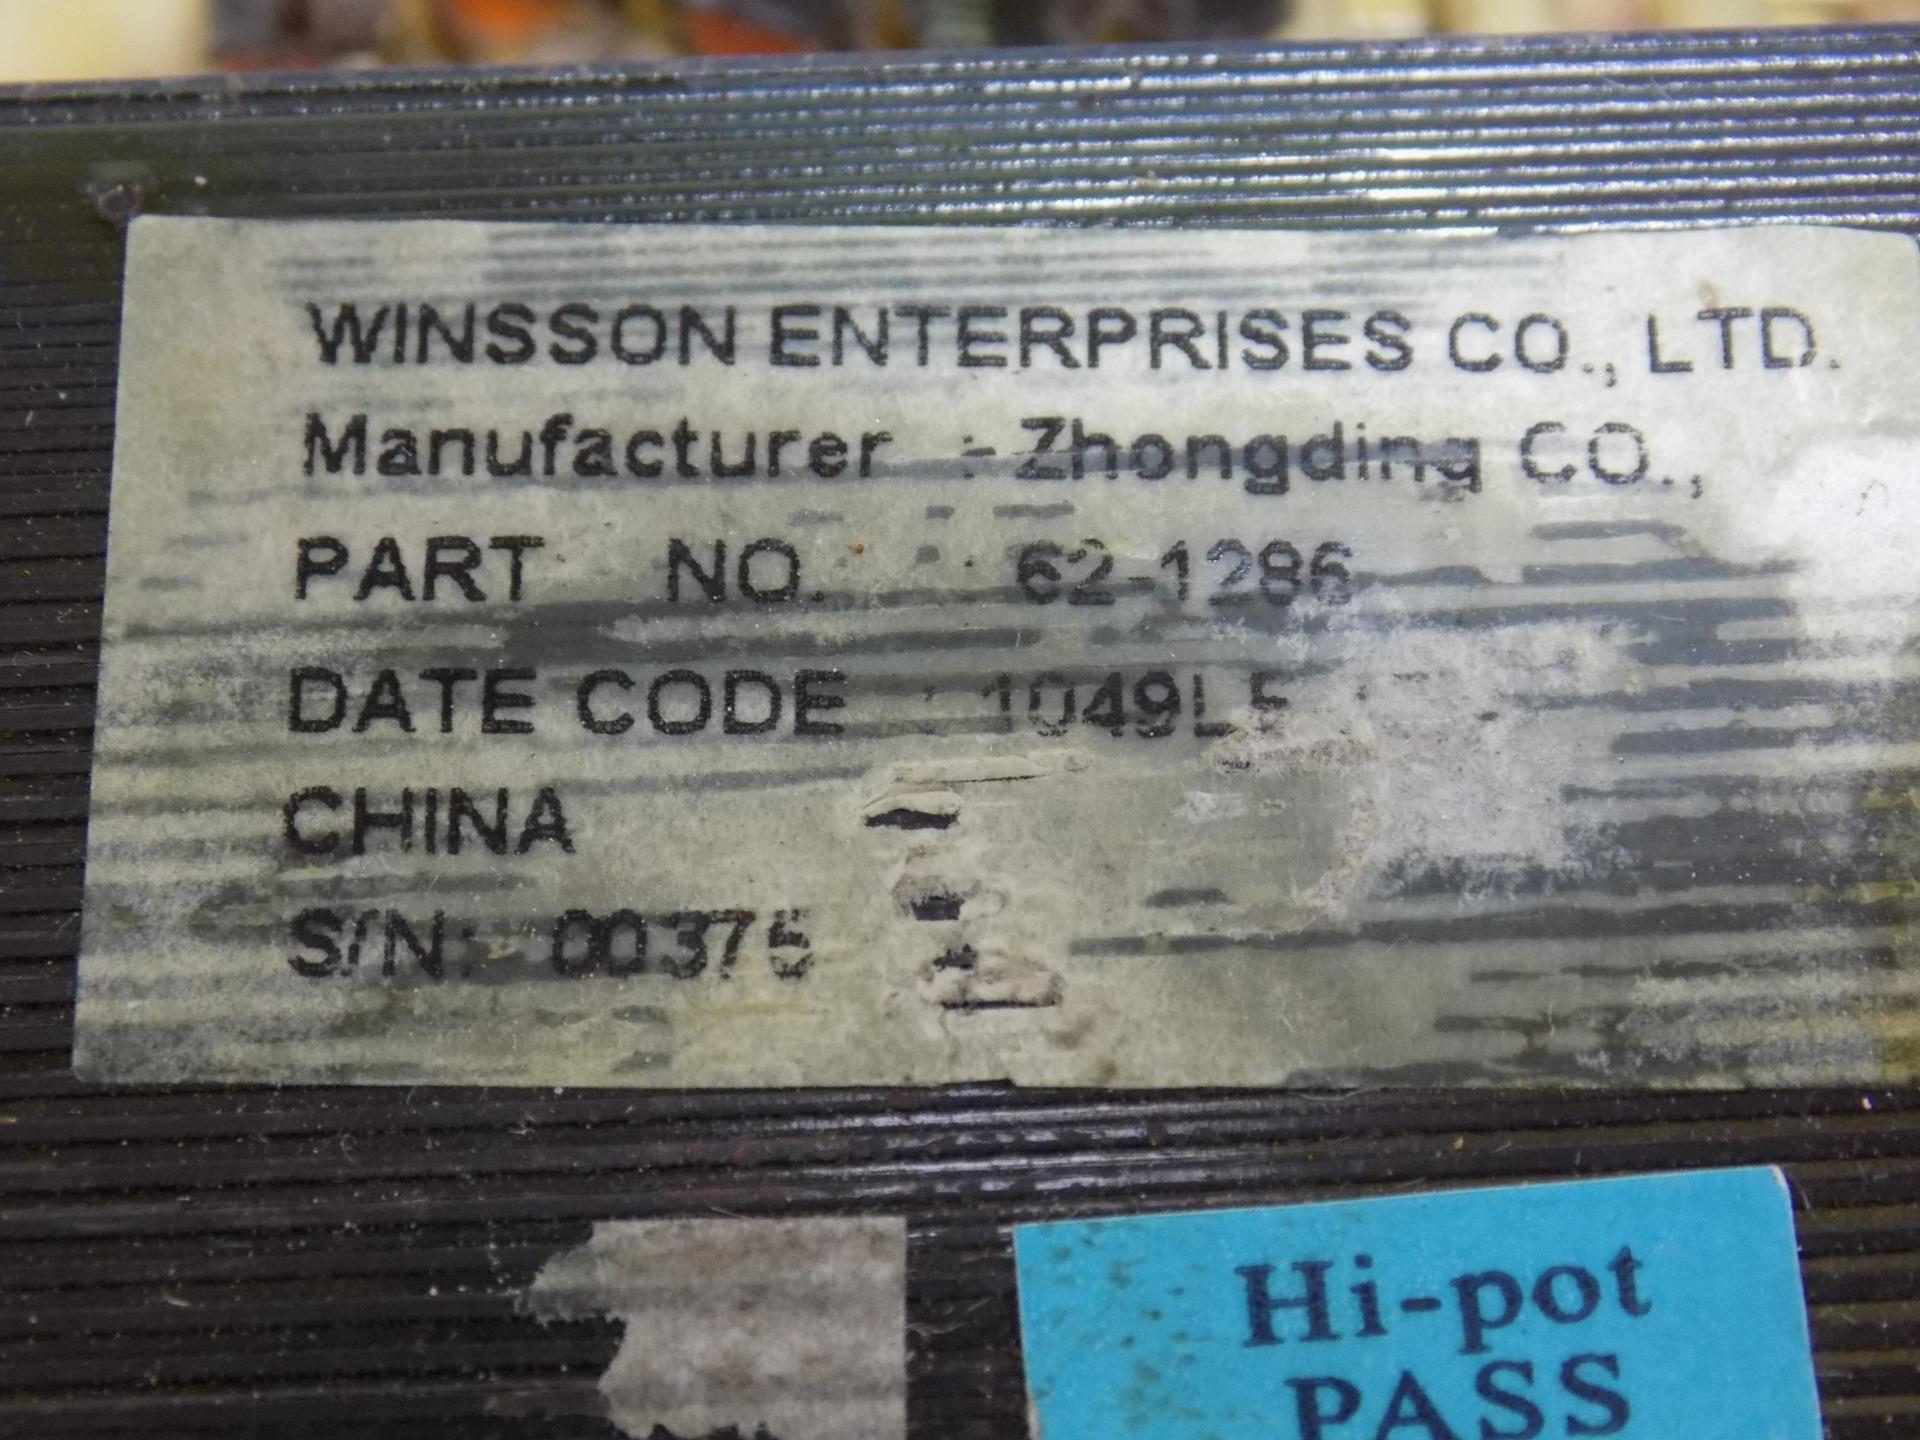 Power Transformer #62-1256 see description WINSSON ZHONGAING